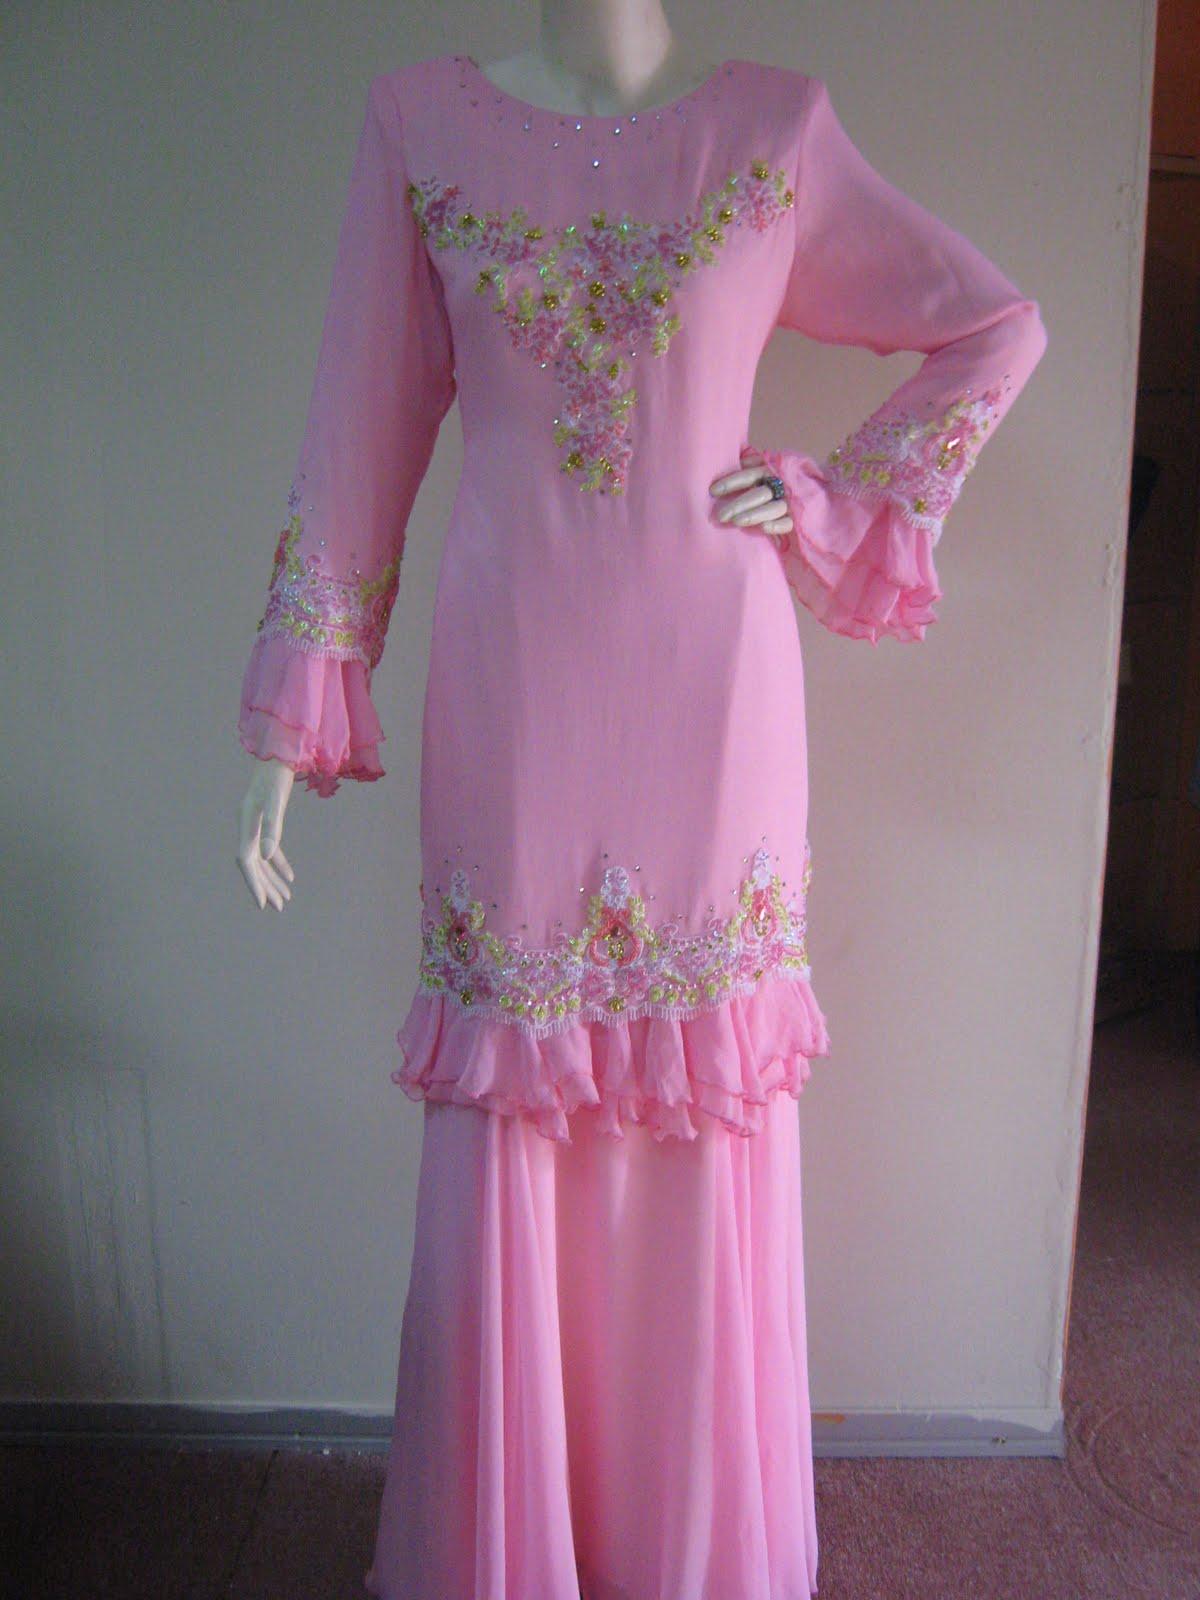 This Picture Fesyen Baju Kurung Moden Kain Lace Portal Pictures